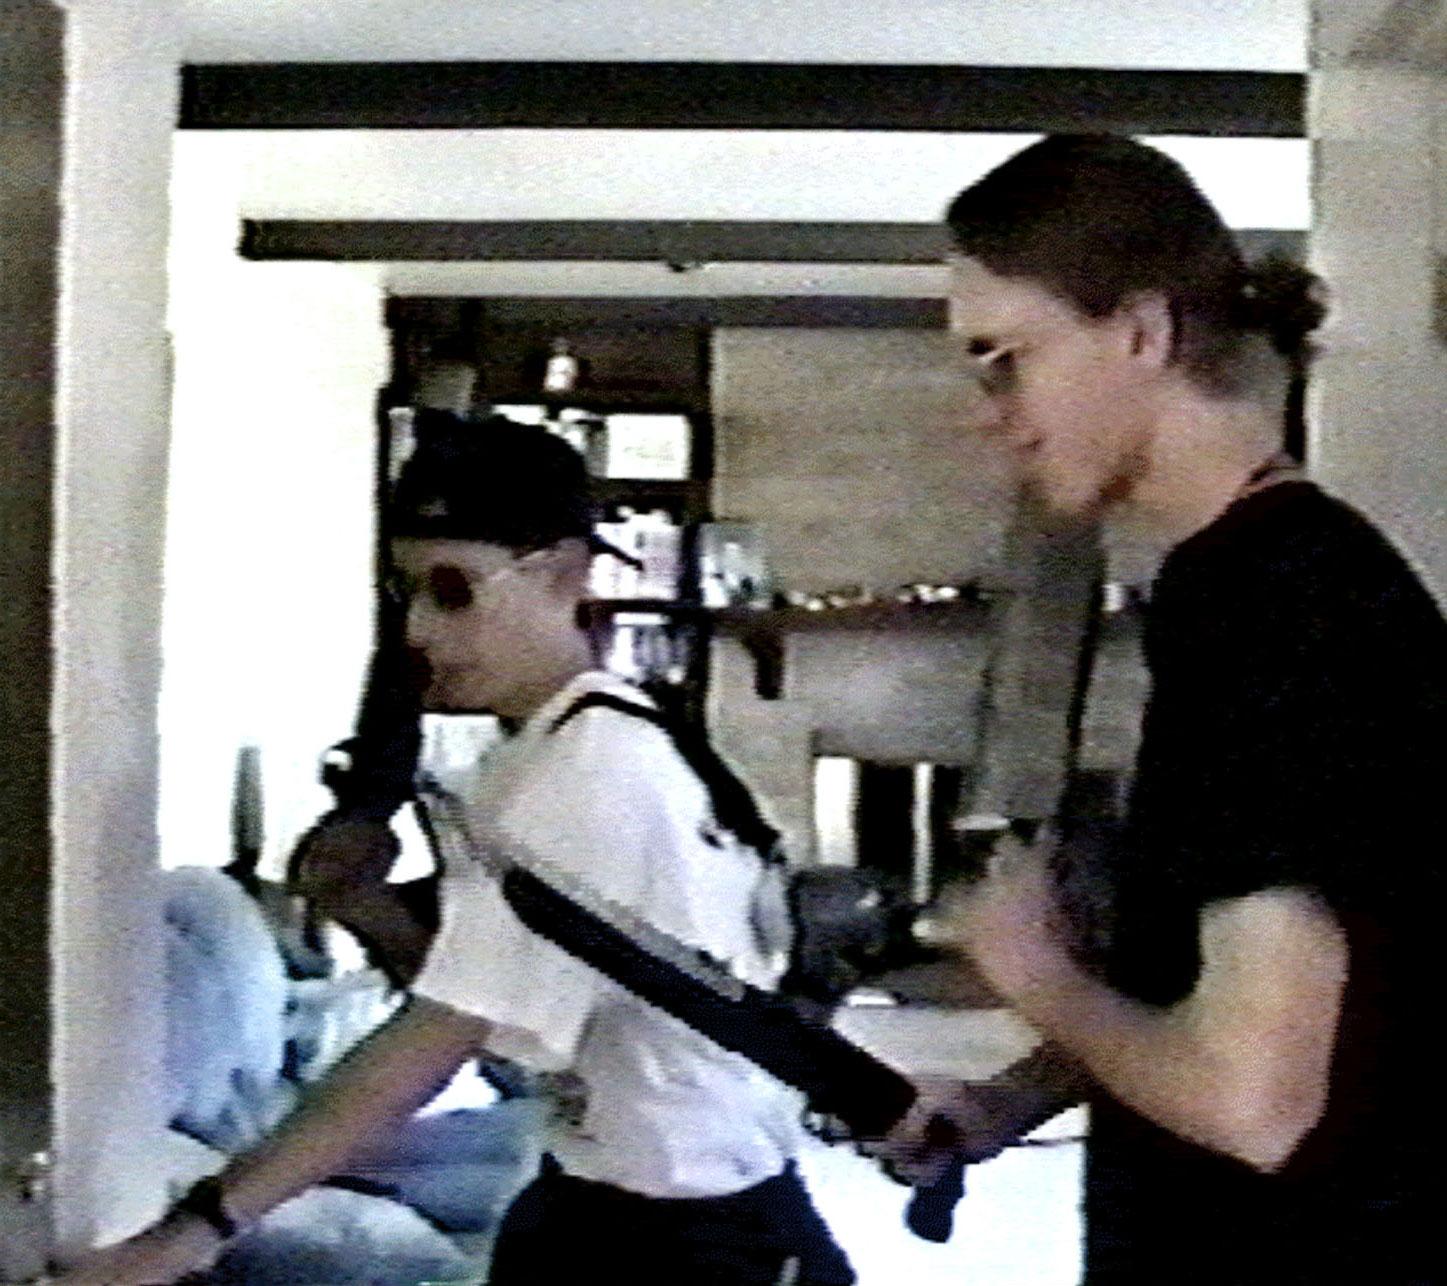 Revisiting The Columbine High School Massacre: 'En Mor Bør Vide'